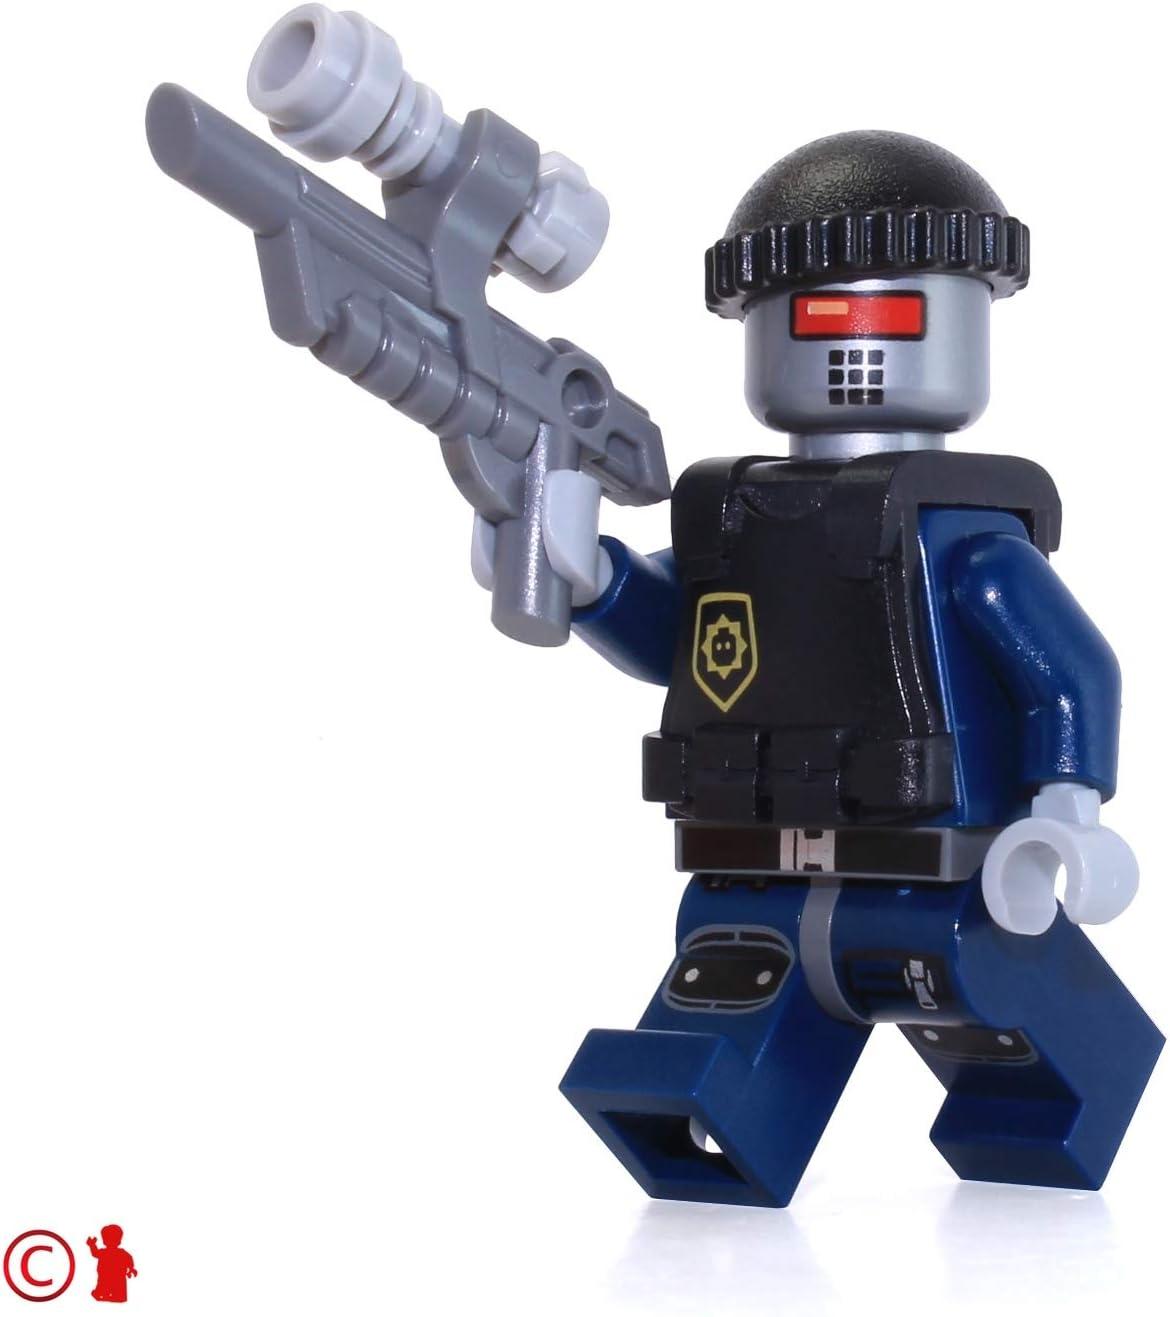 LEGO The Lego Movie Robot Swat with Vest Helmet Minifigure 70808 Robo Mini Fig